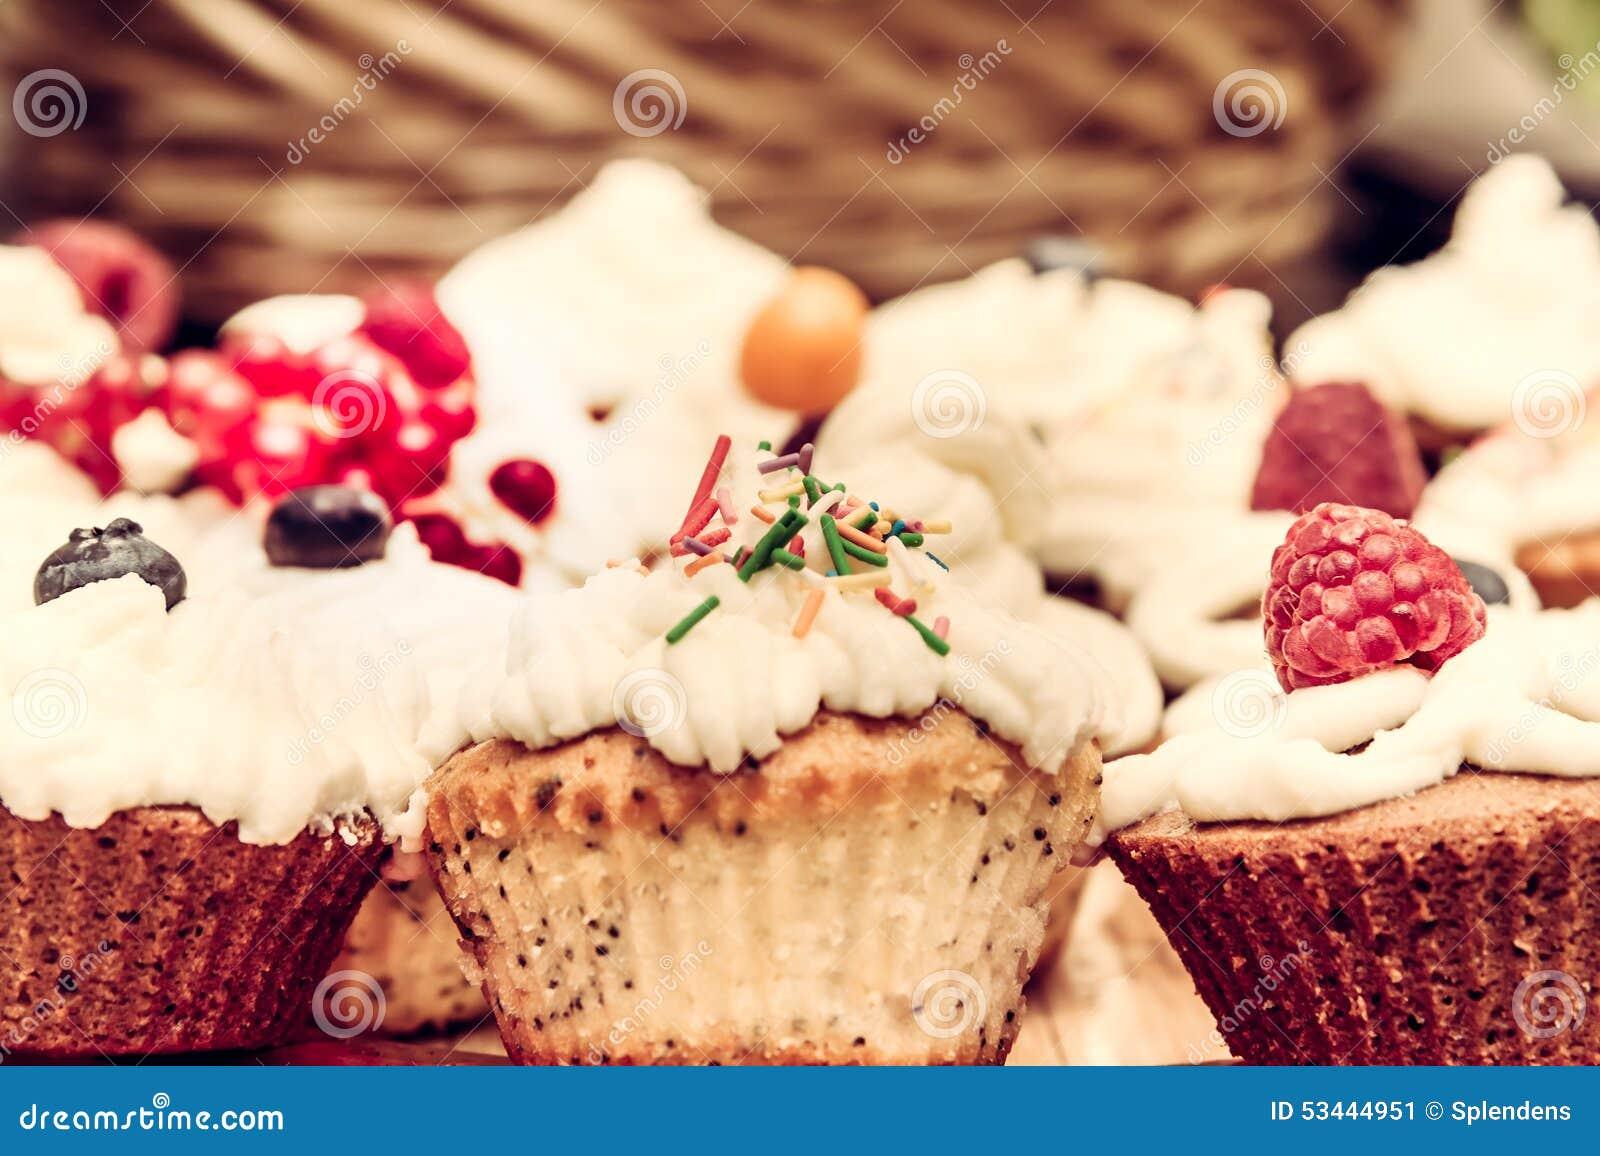 Homemade Vintage Cakes Stock Photo - Image: 53444951